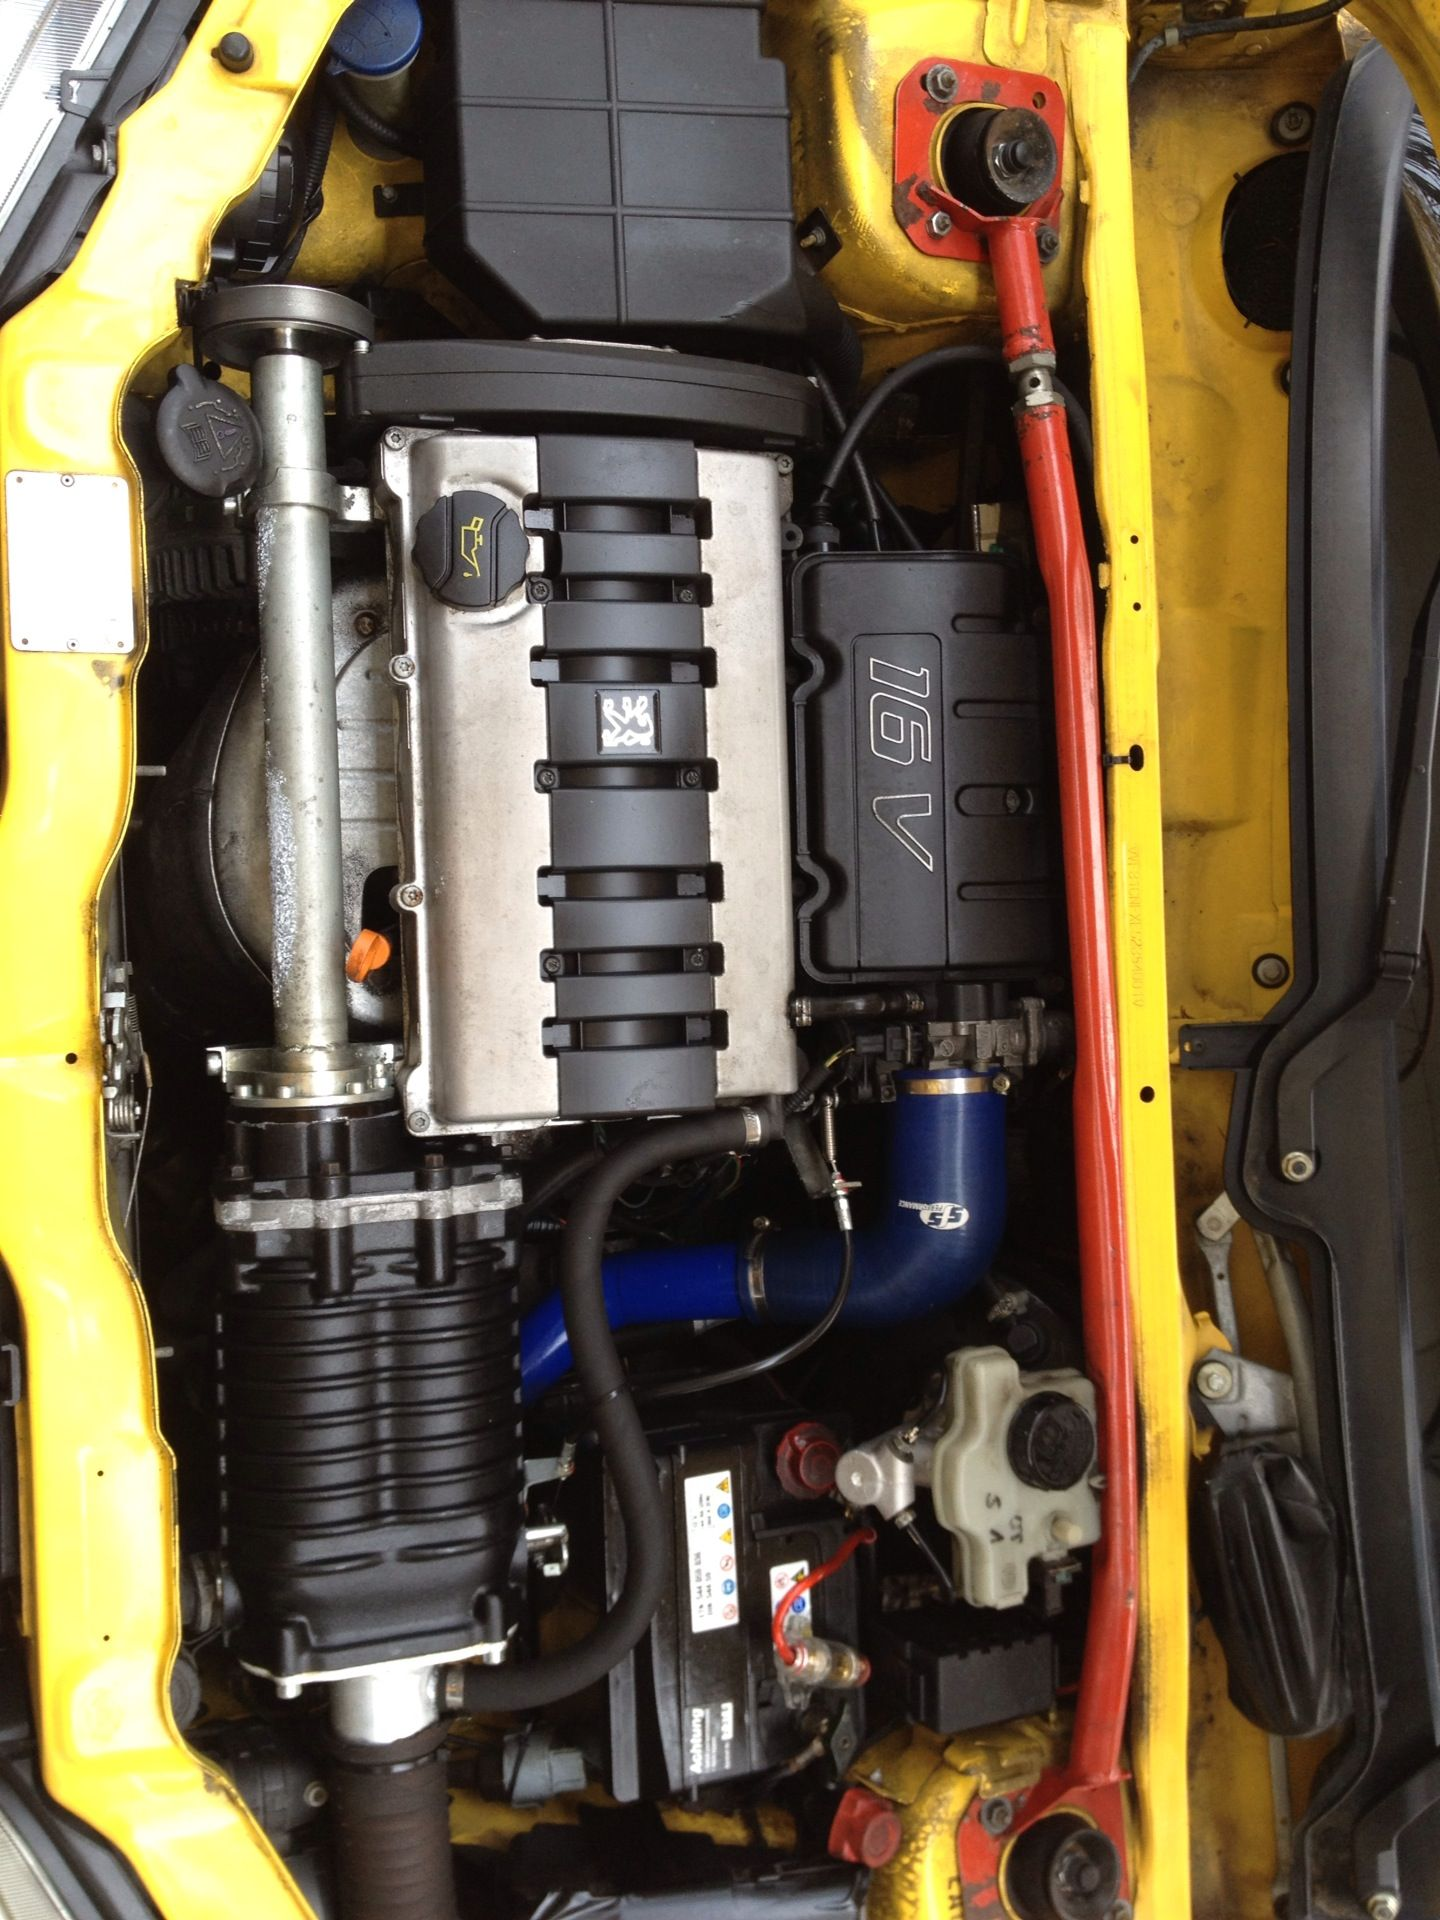 peugeot 106 s16 supercharged bemani | cars | pinterest | peugeot